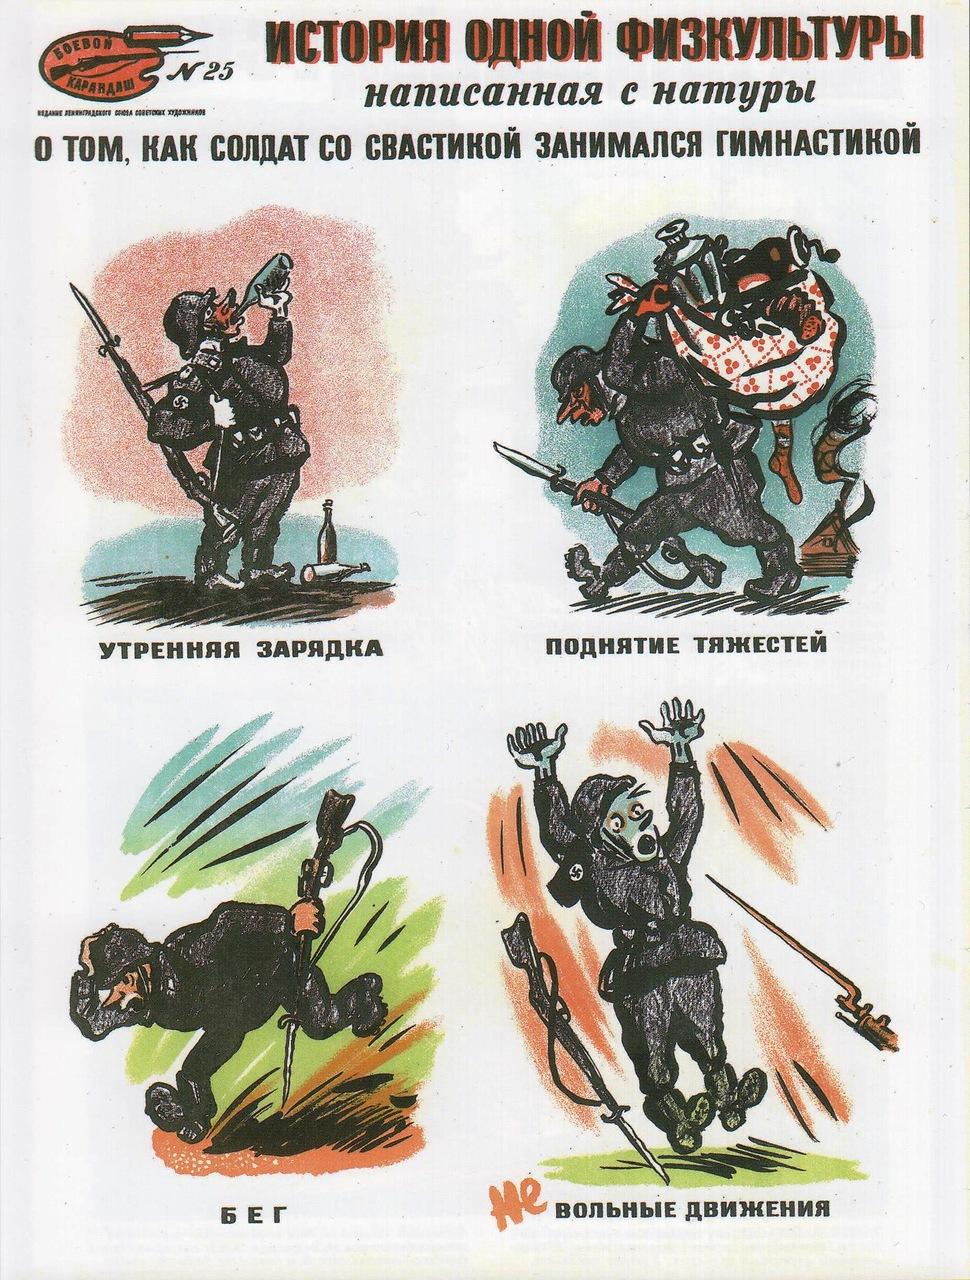 http://propagandahistory.ru/pics/2014/01/1390139605_eecb.jpg height=960